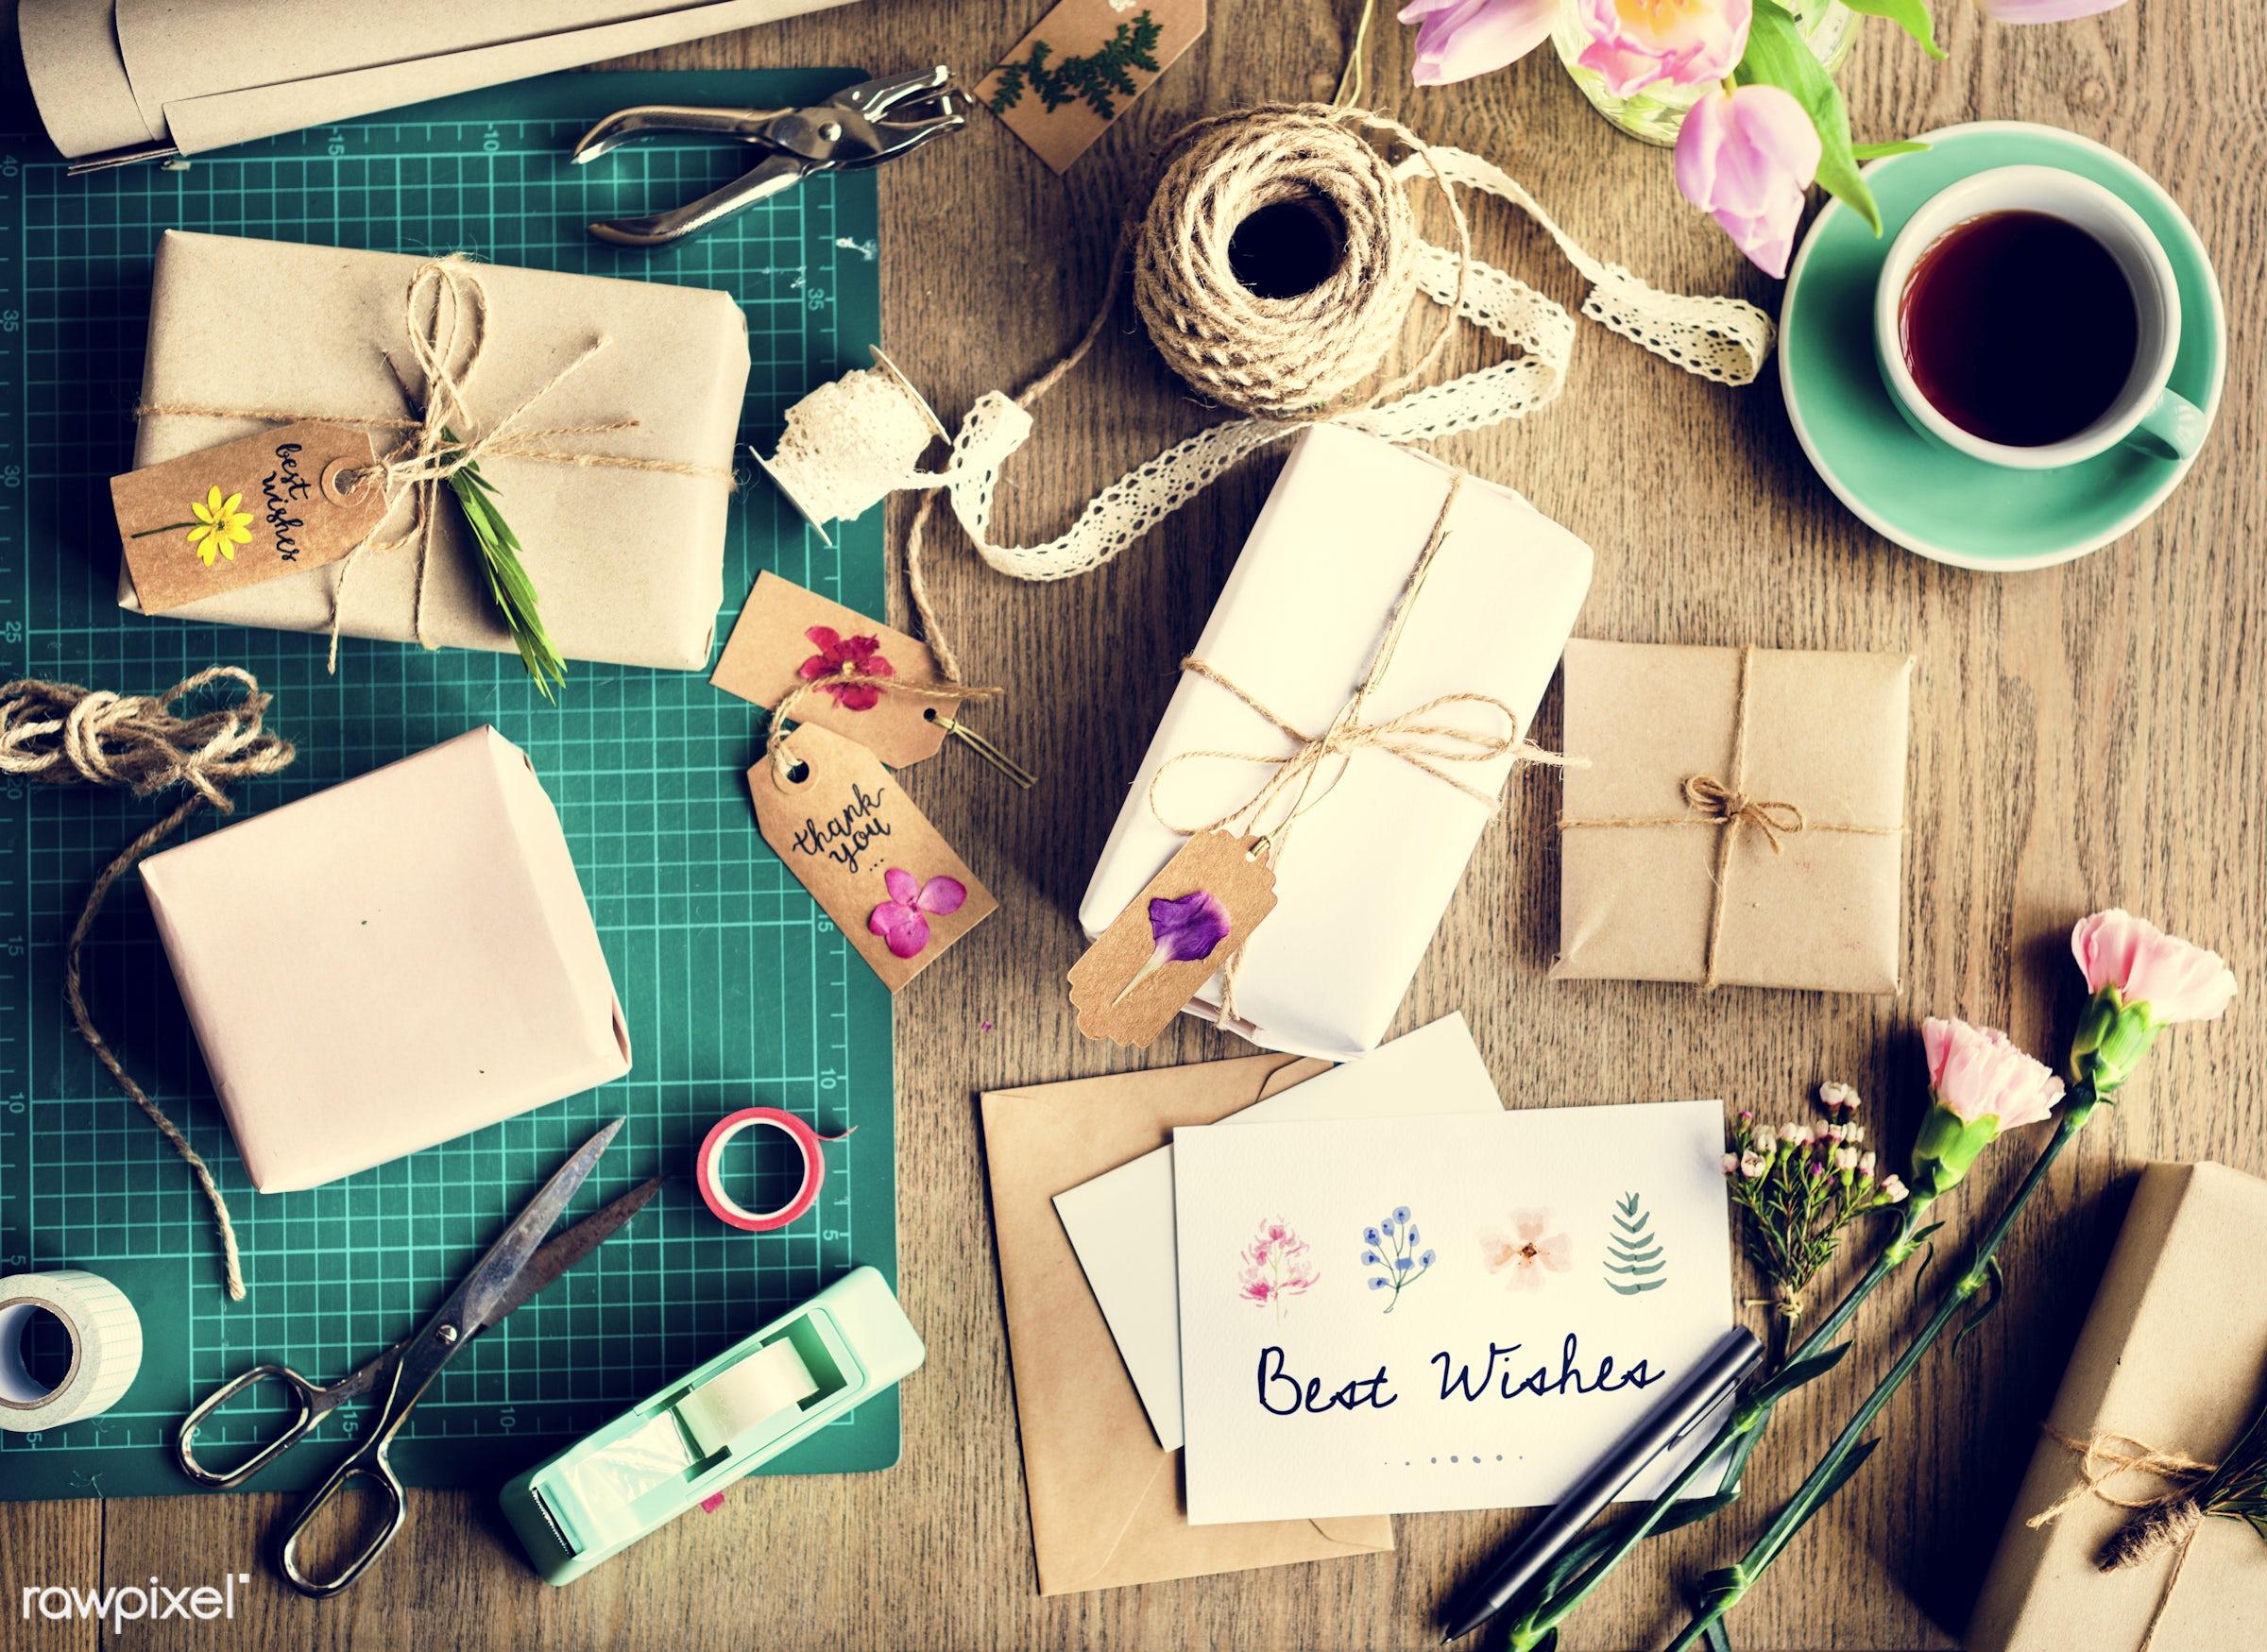 nobody, detail, gift, decorative, wish, handicraft, writing, show, dried, attractive, written, write, wooden background,...